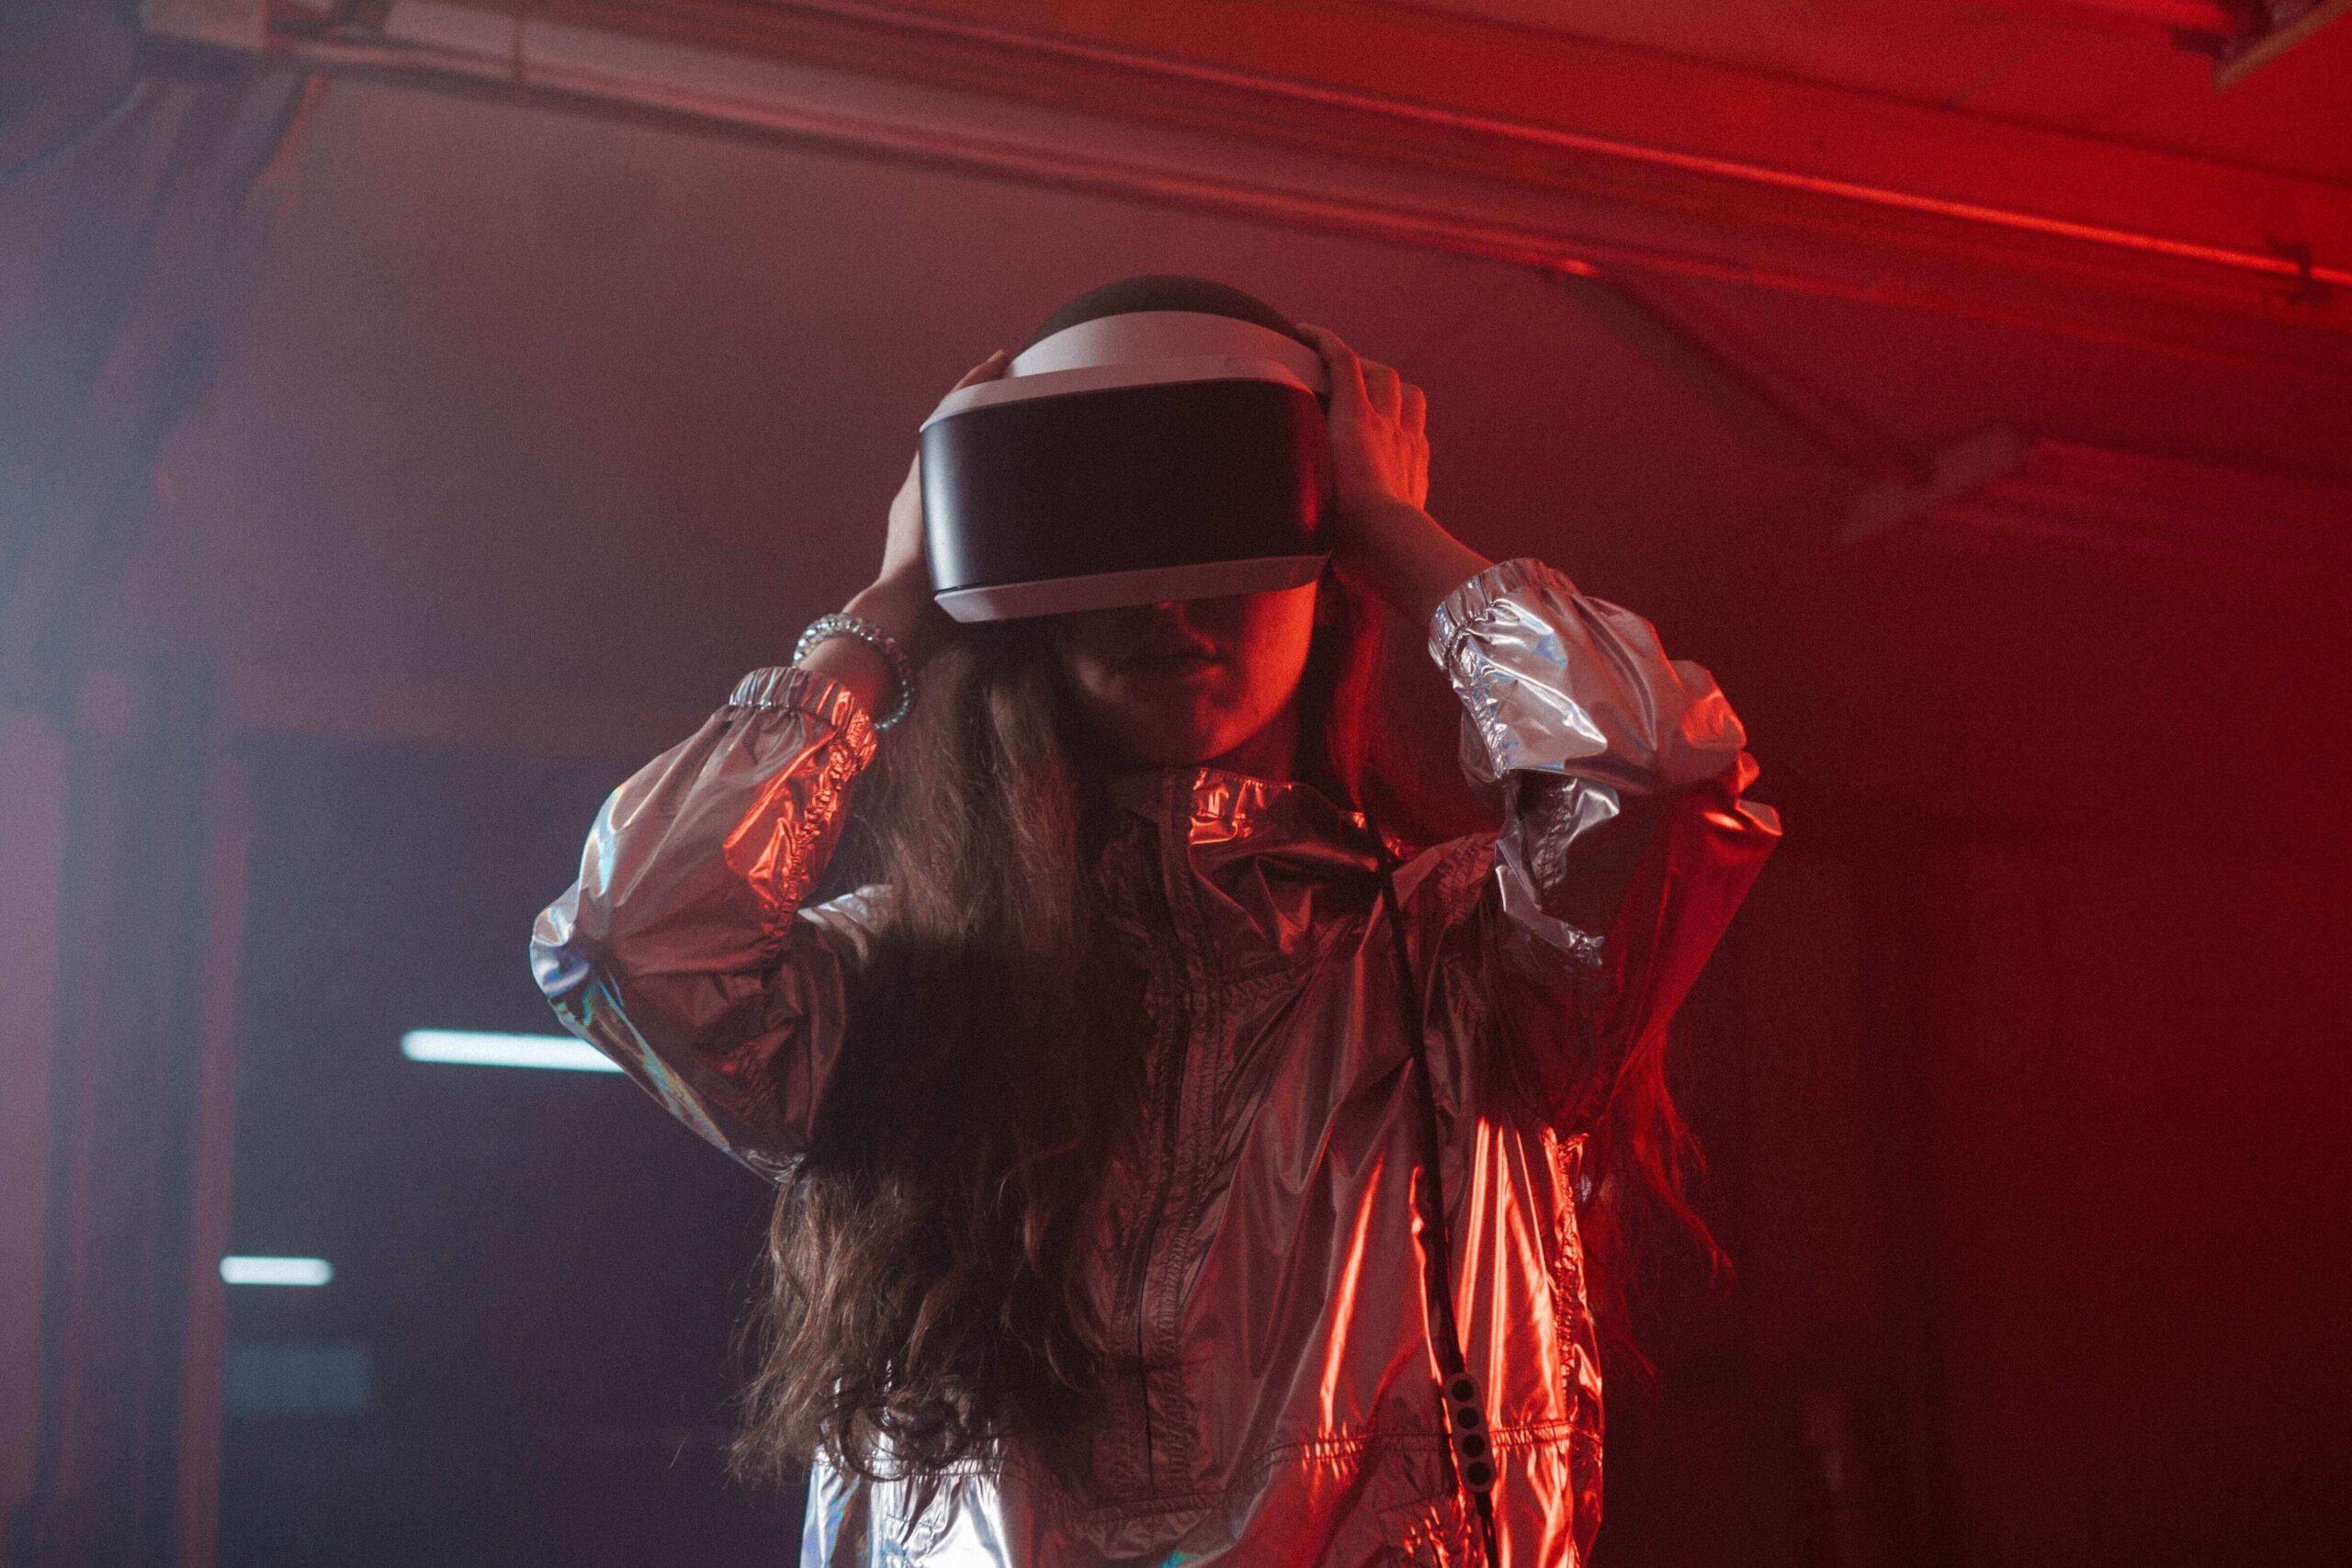 VR Arcade